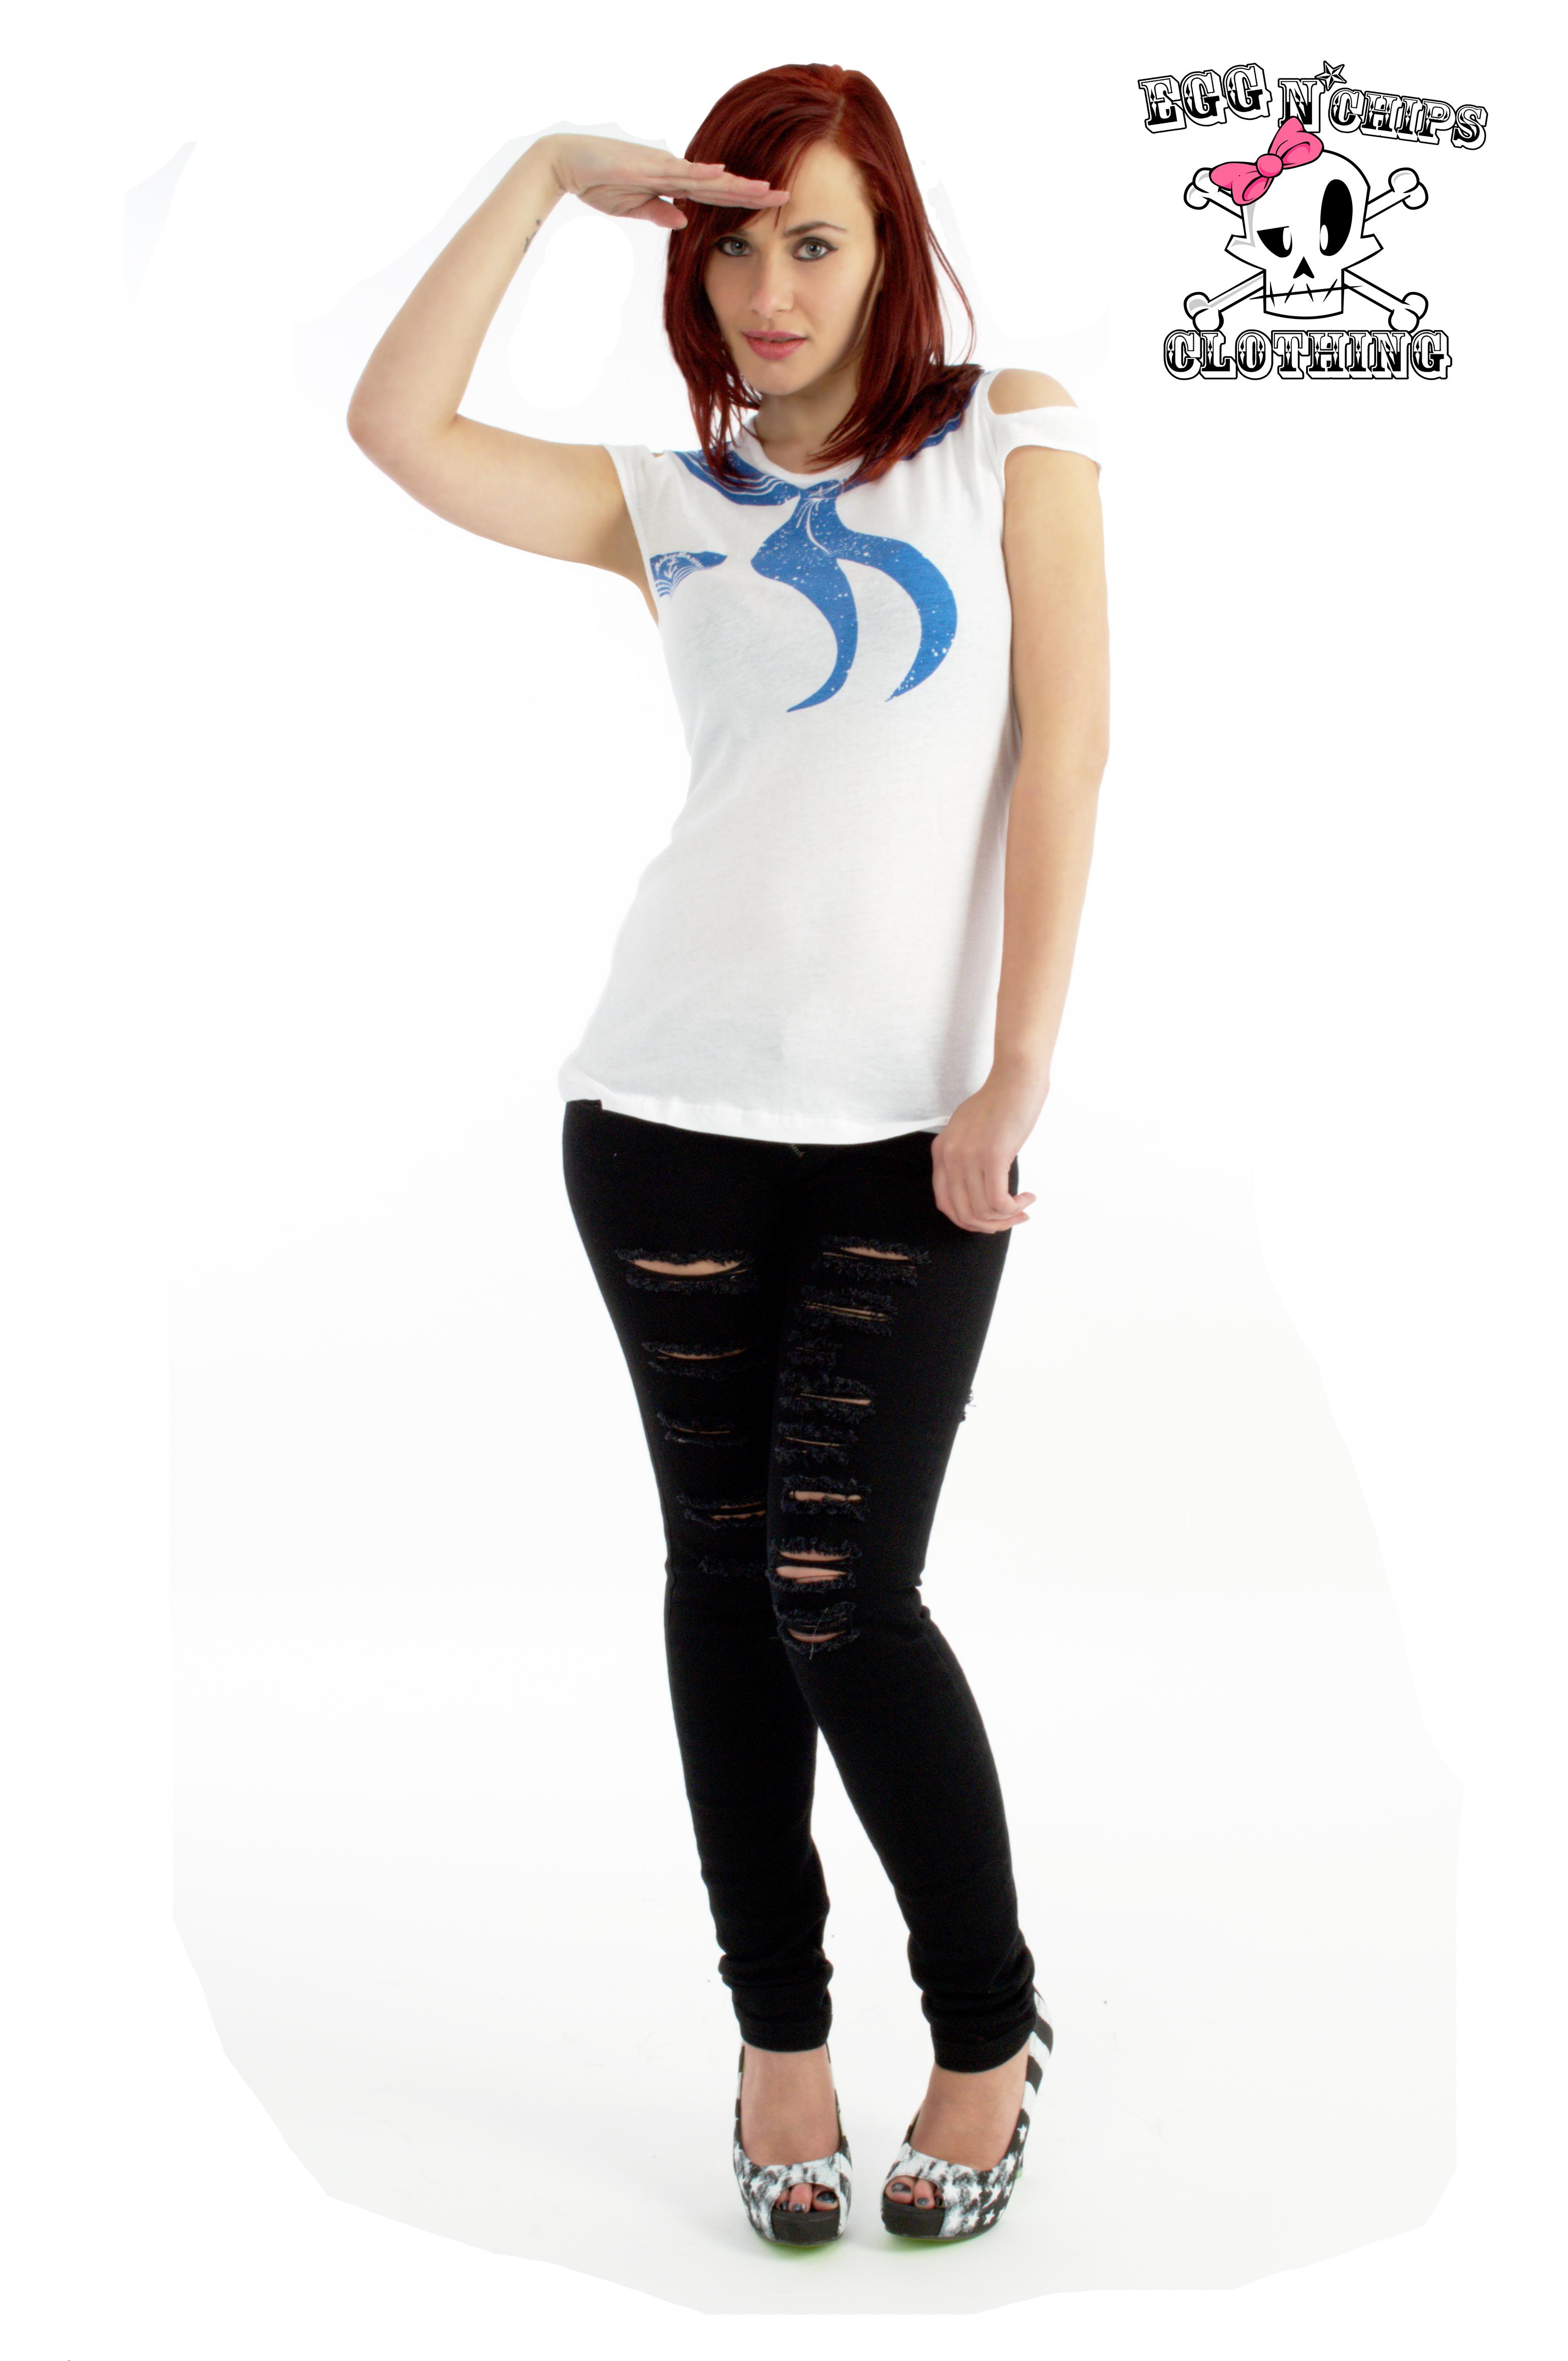 abbey_dawn_womens_sailorette_nautical_top_avril_lavigne_t_shirts_2.jpg